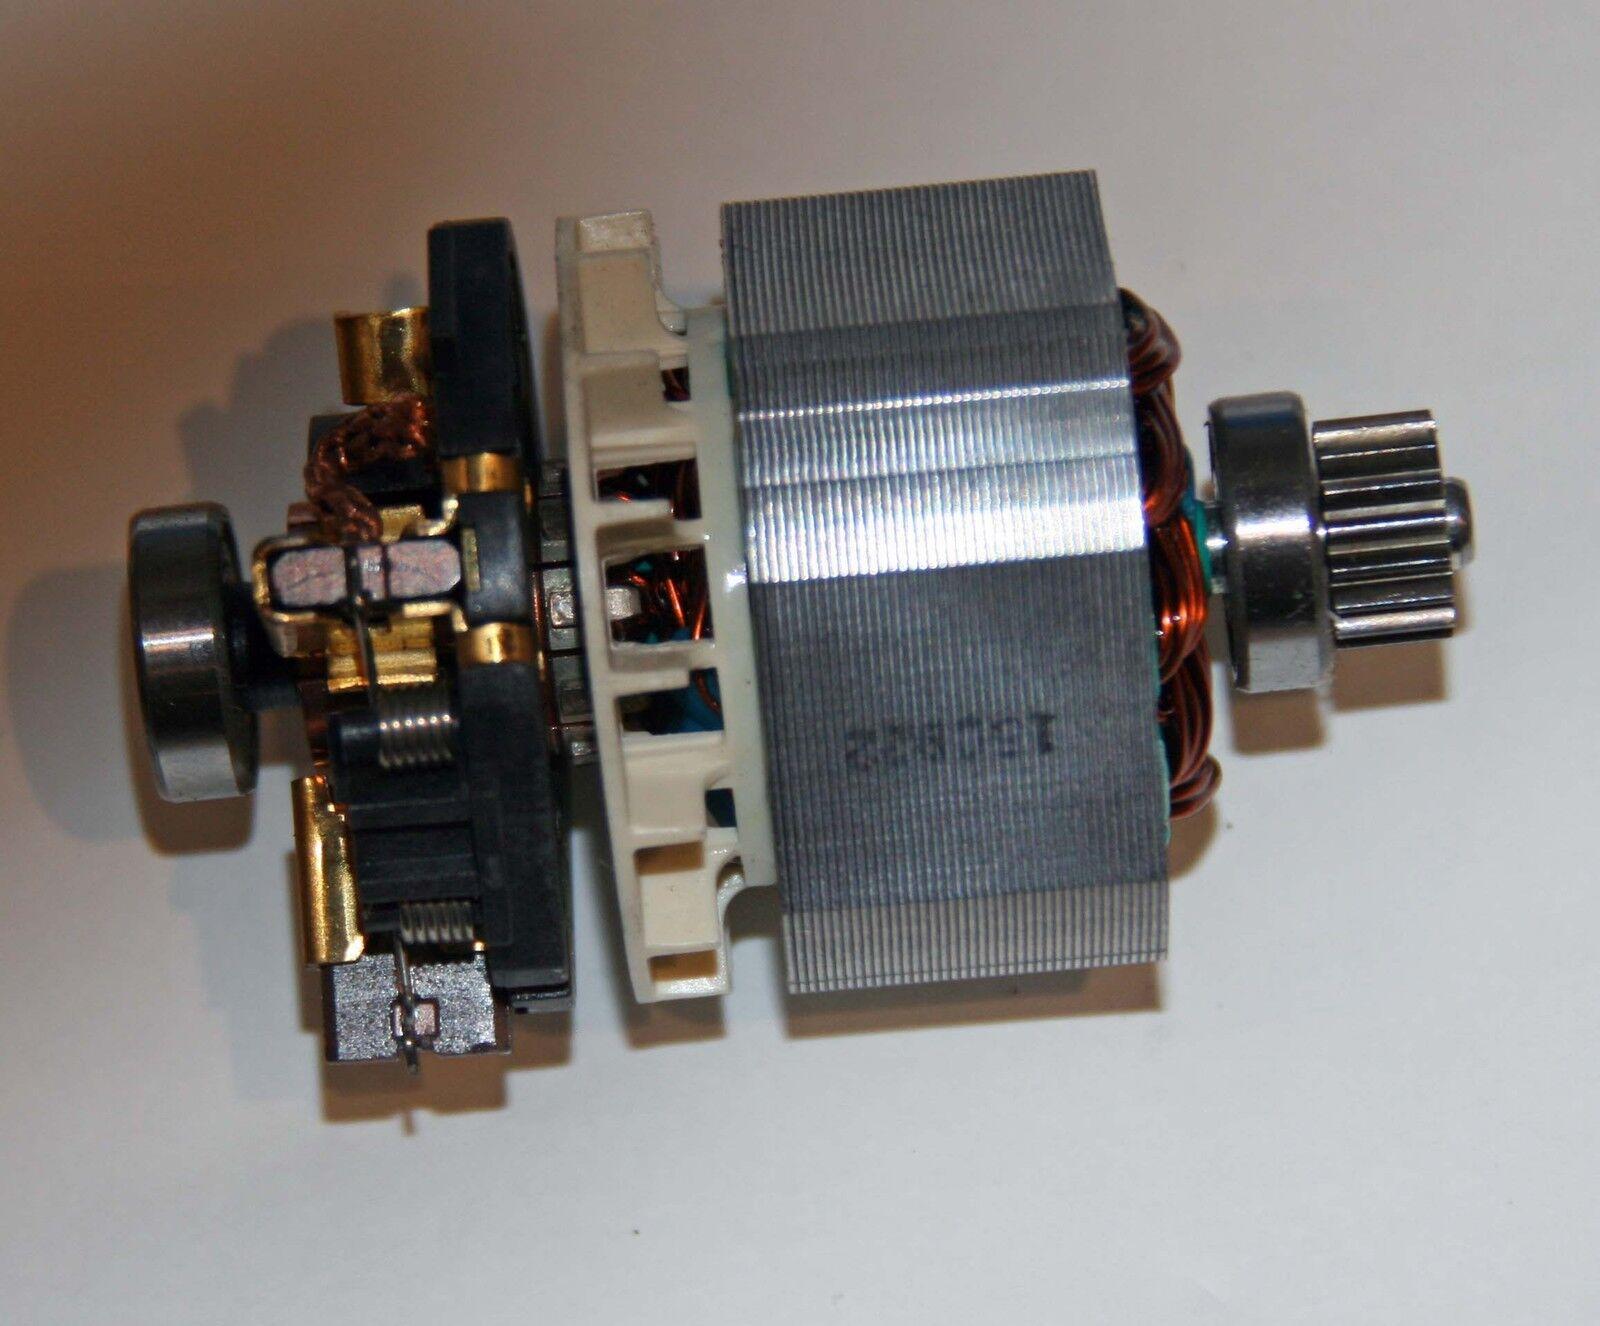 Motor Bosch GSR GSB 14,4 Li  BA 14 A SDI 146 BS 14 A Dremel 4000  2609199358